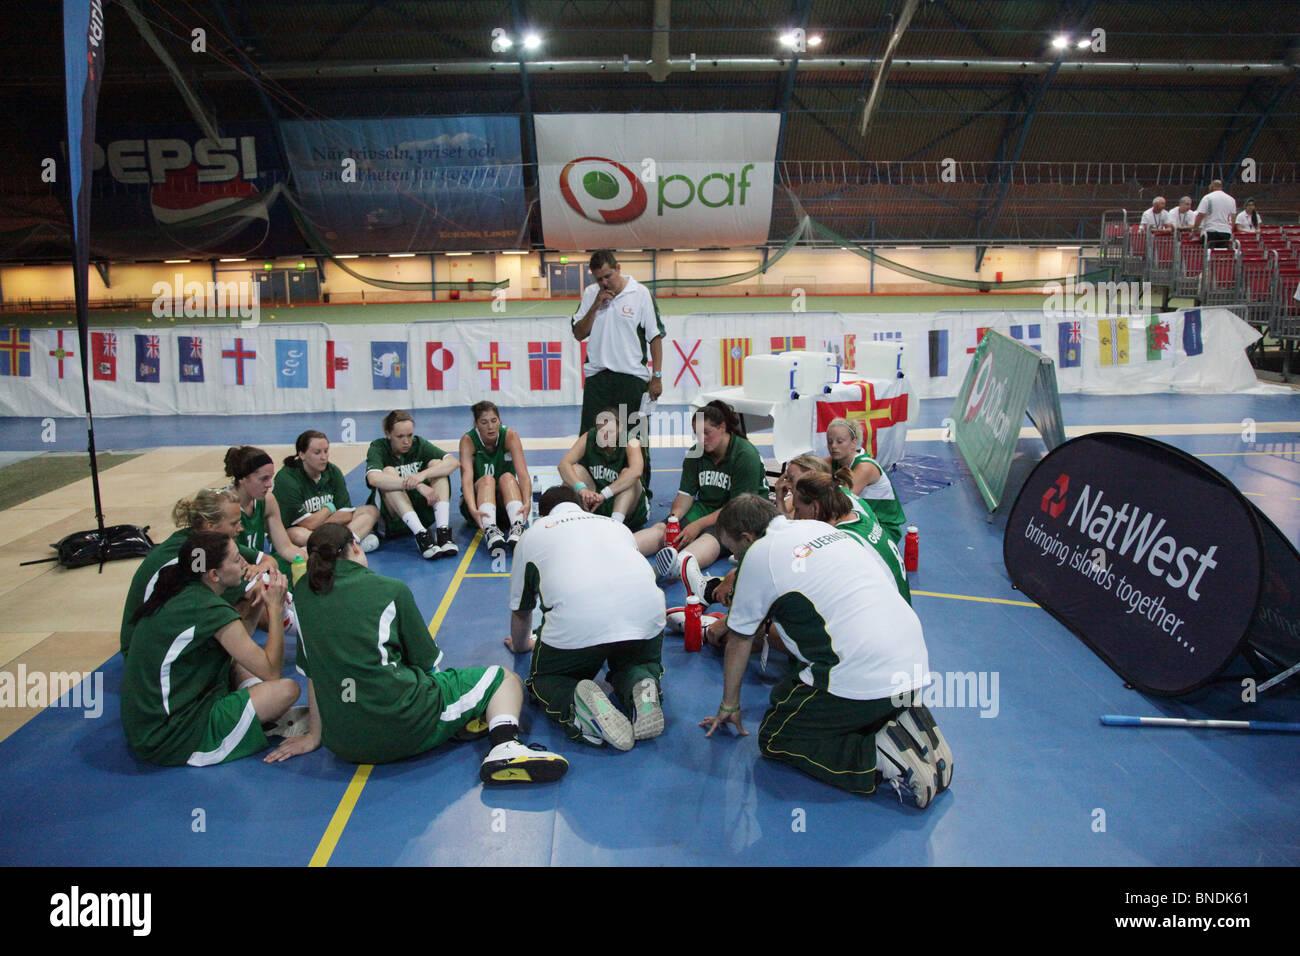 El Baloncesto Femenino Final derrota de Menorca Guernsey NatWest Island Games 2009 en Eckeröhallen en Åland, Imagen De Stock